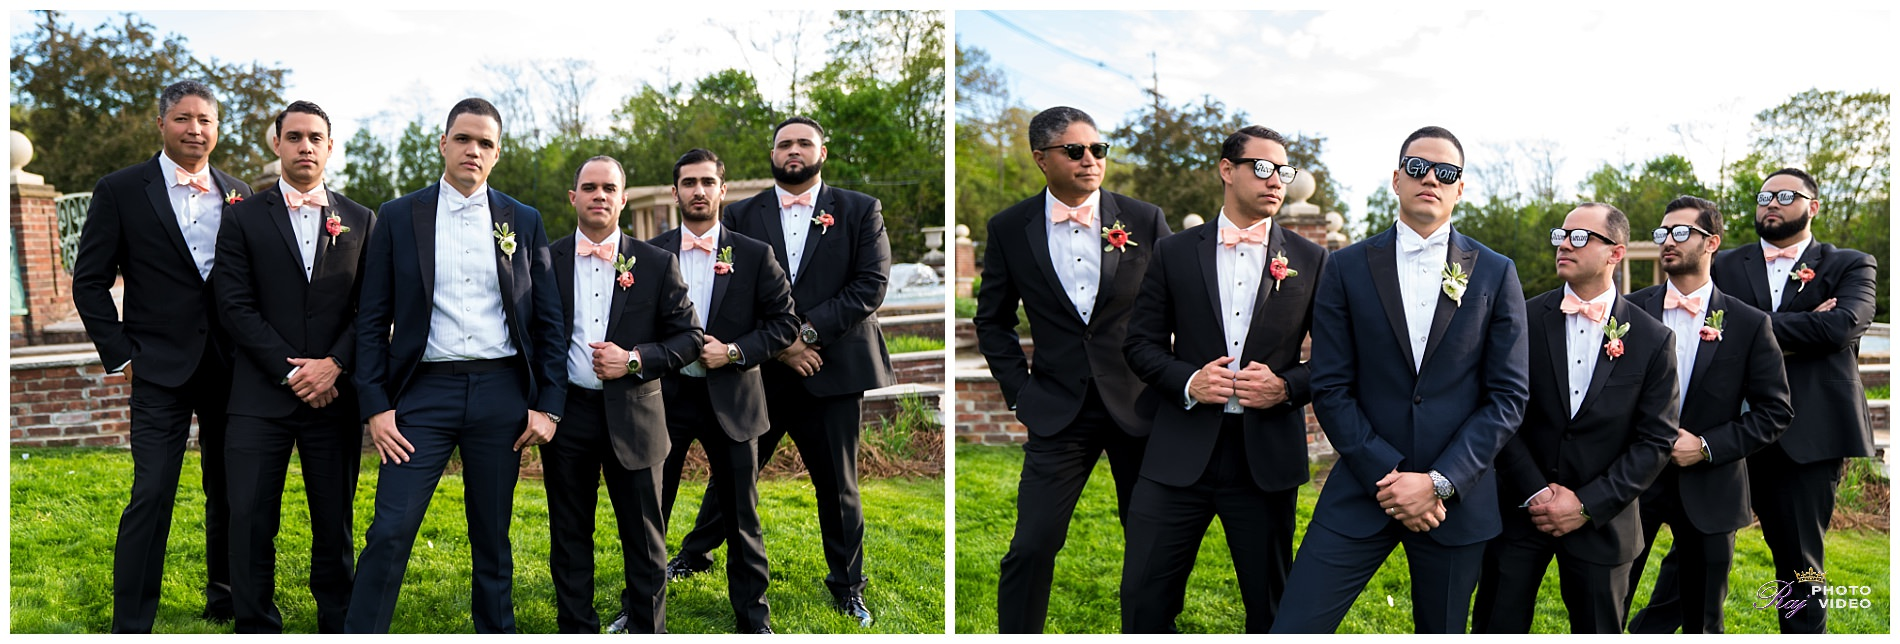 The-Manor-West-Orange-NJ-Wedding-Reception-Yanet-Jose-9.jpg